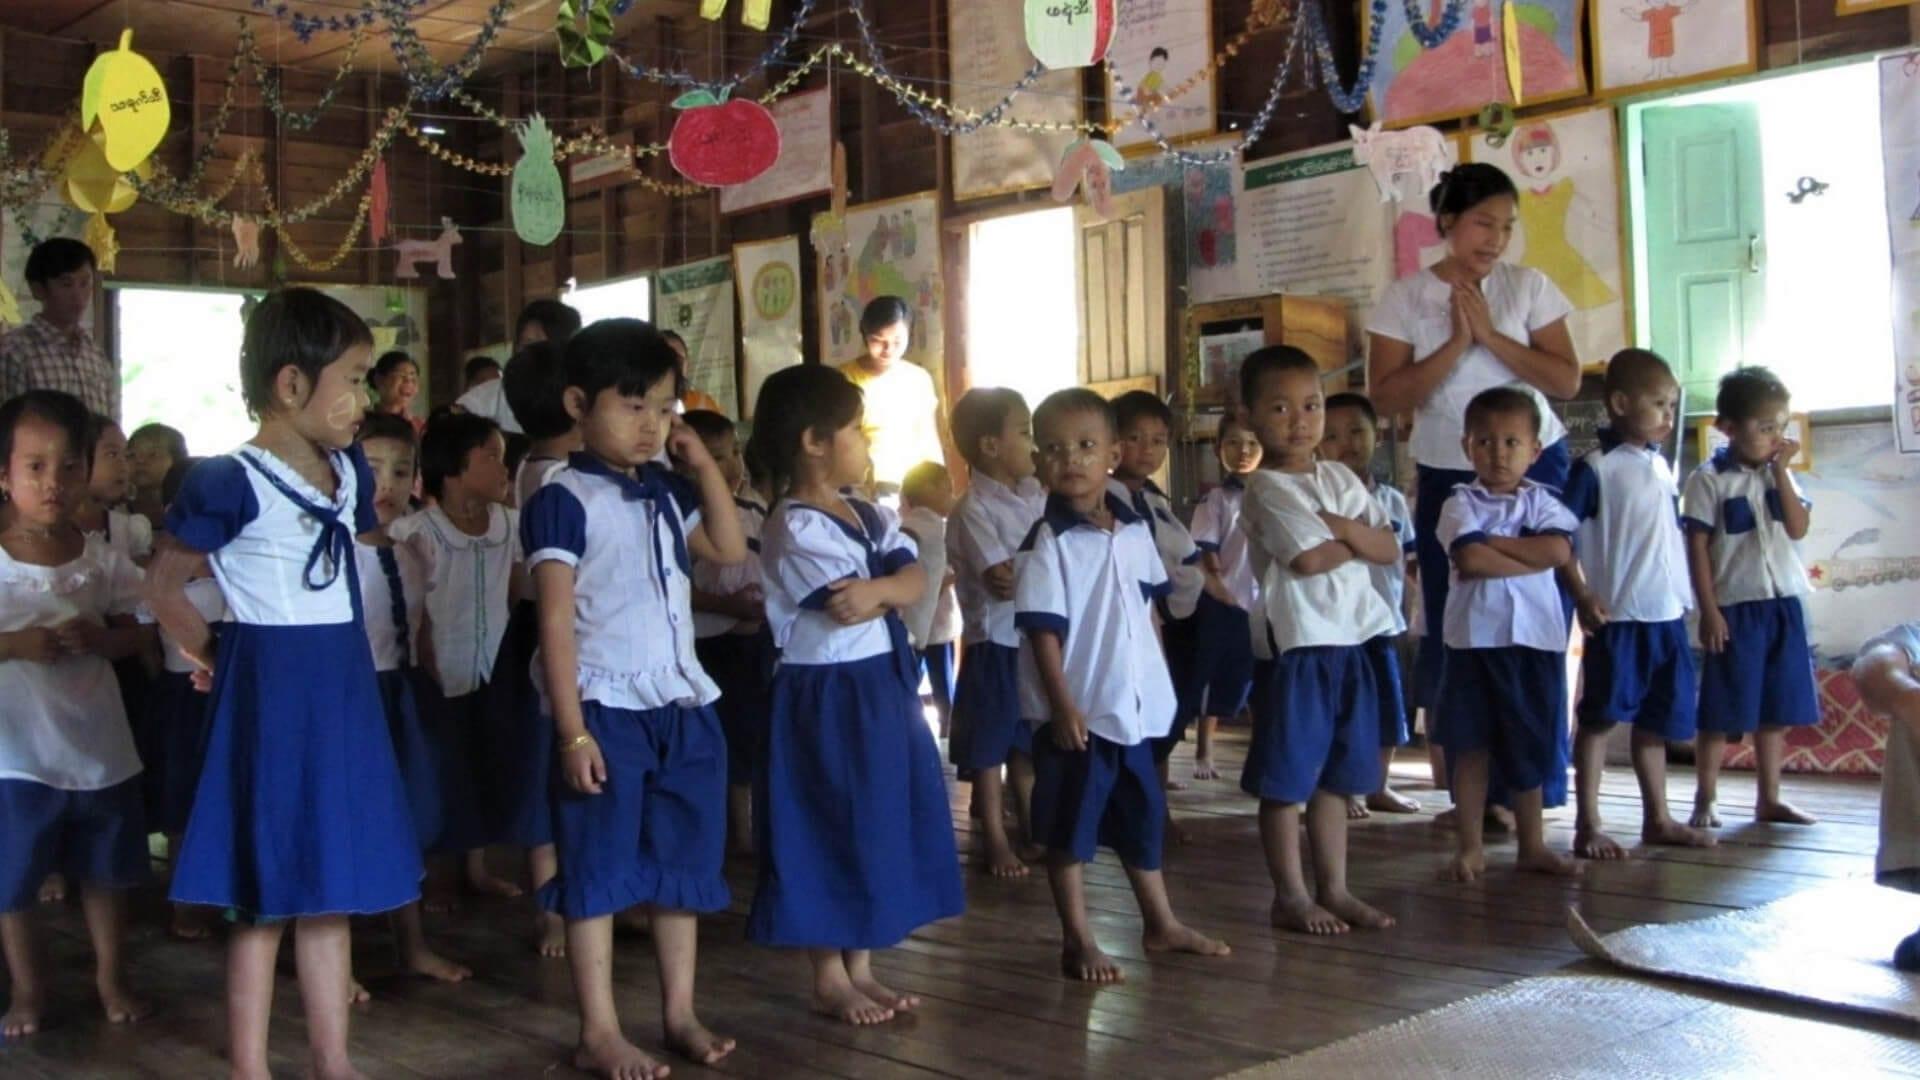 Children in school uniforms are standing in line in Asia.